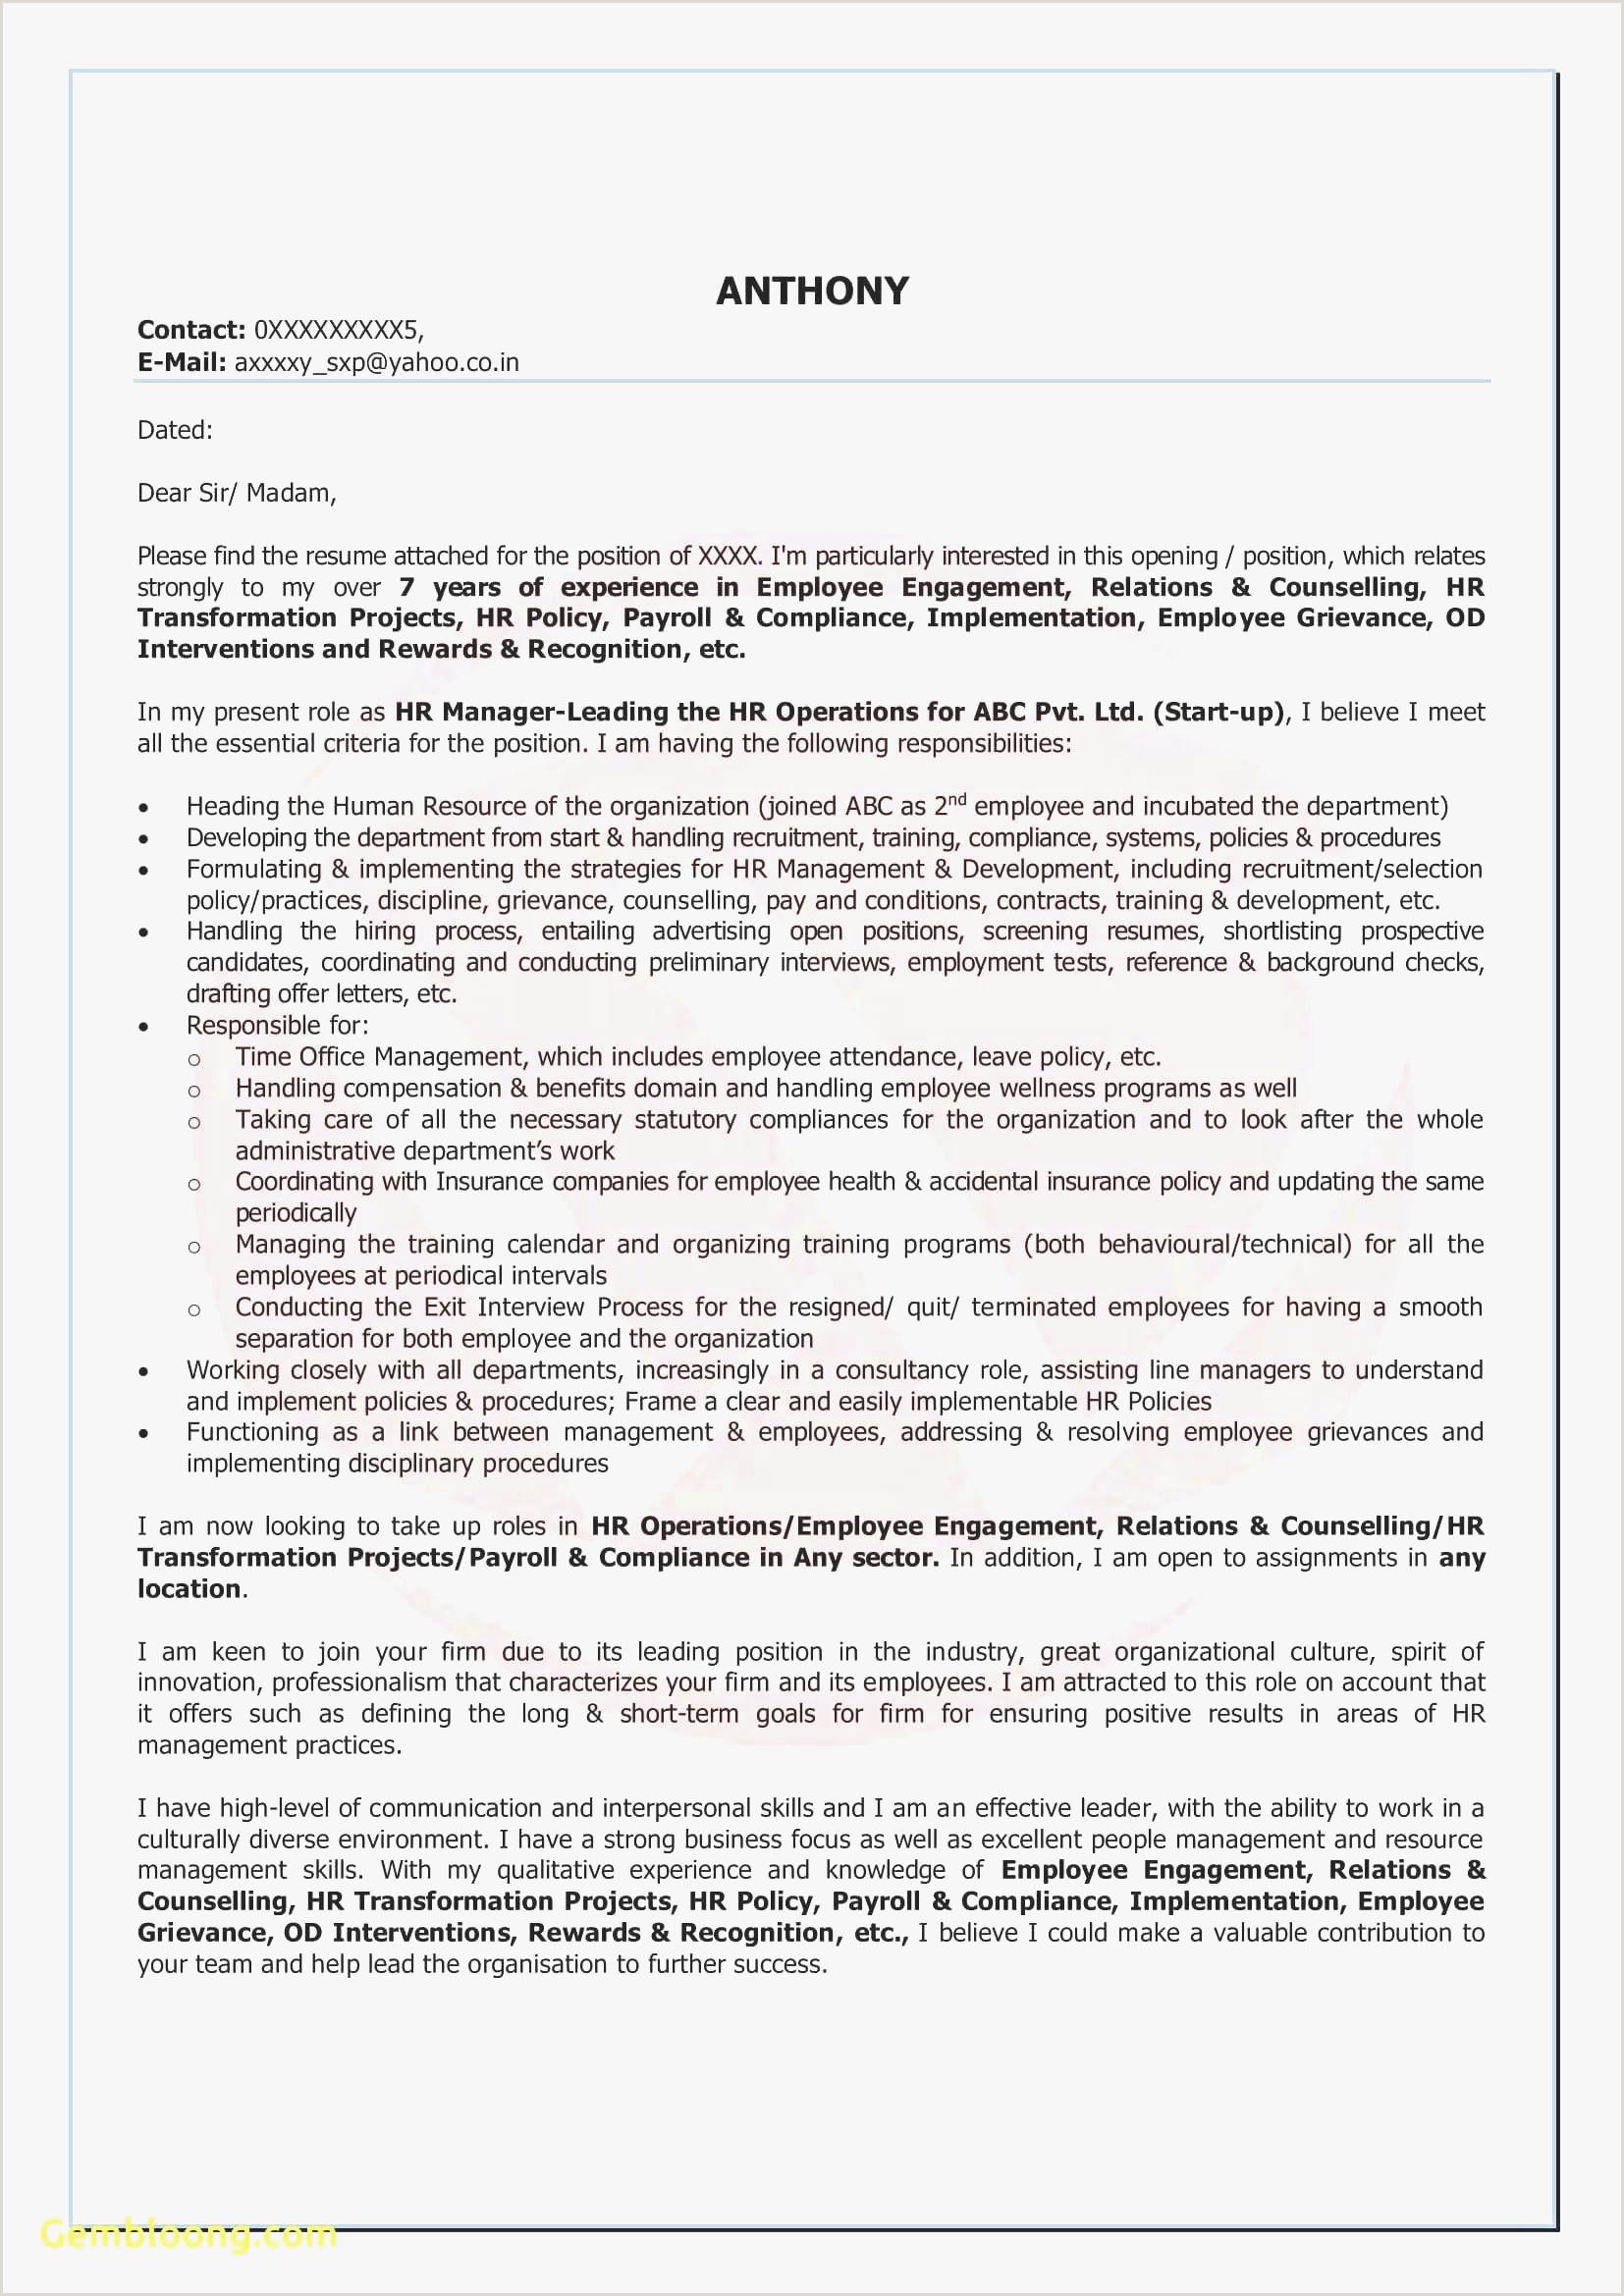 Cover Letter Examples Data Entry Clerical Cover Letter Luxury Resume for Data Entry Job